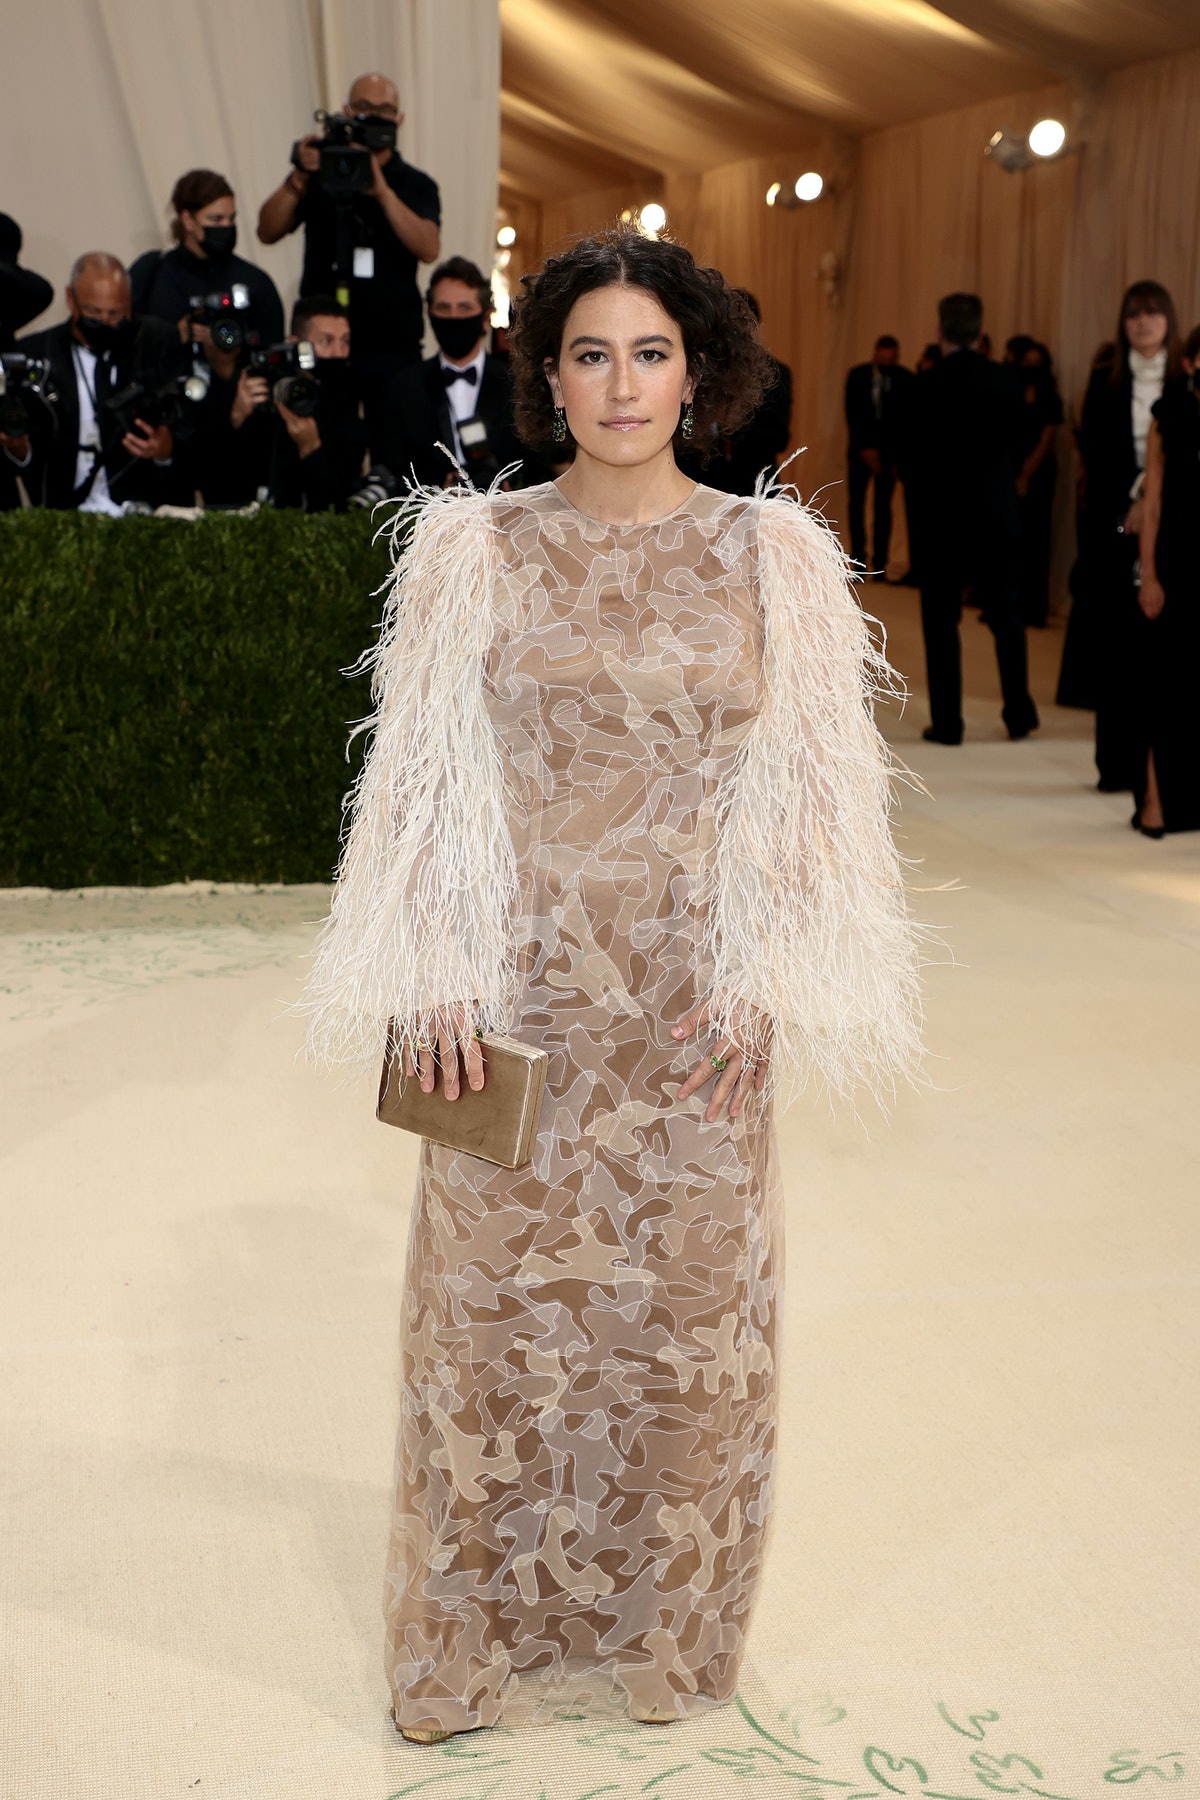 Ilana Glazer attends The 2021 Met Gala Celebrating In America: A Lexicon Of Fashion at Metropolitan ...